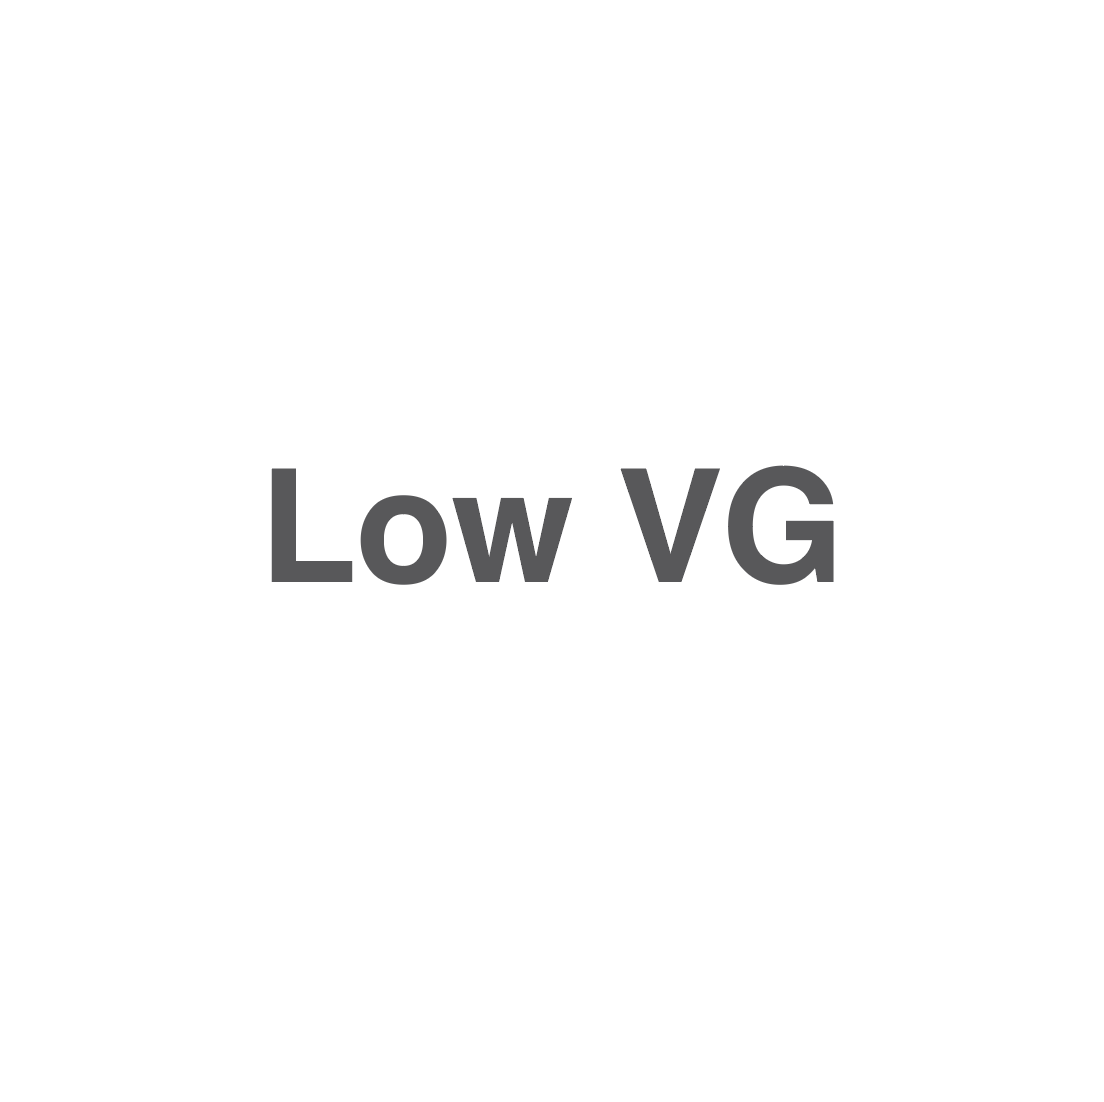 Low VG